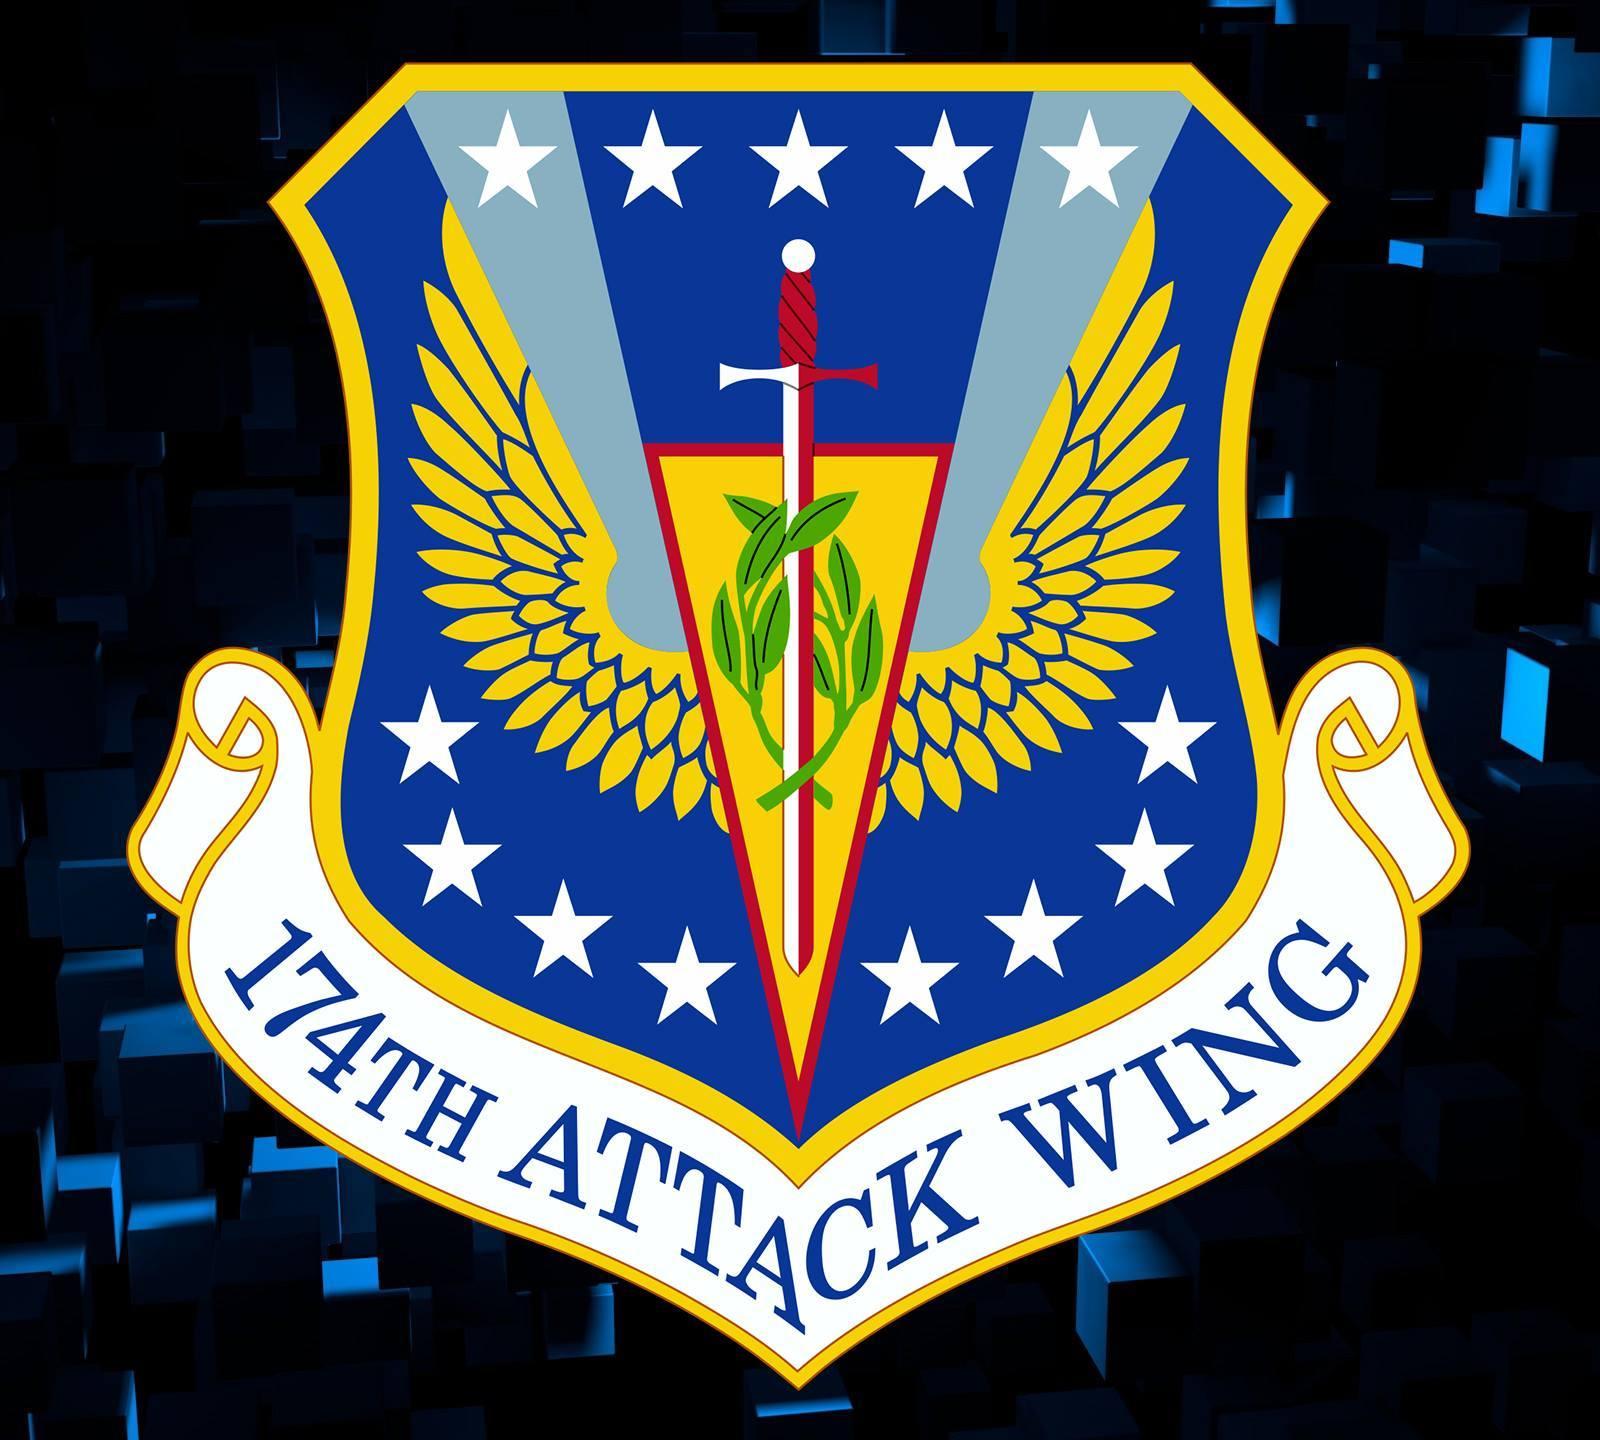 174th Attack Wing Air National Guard